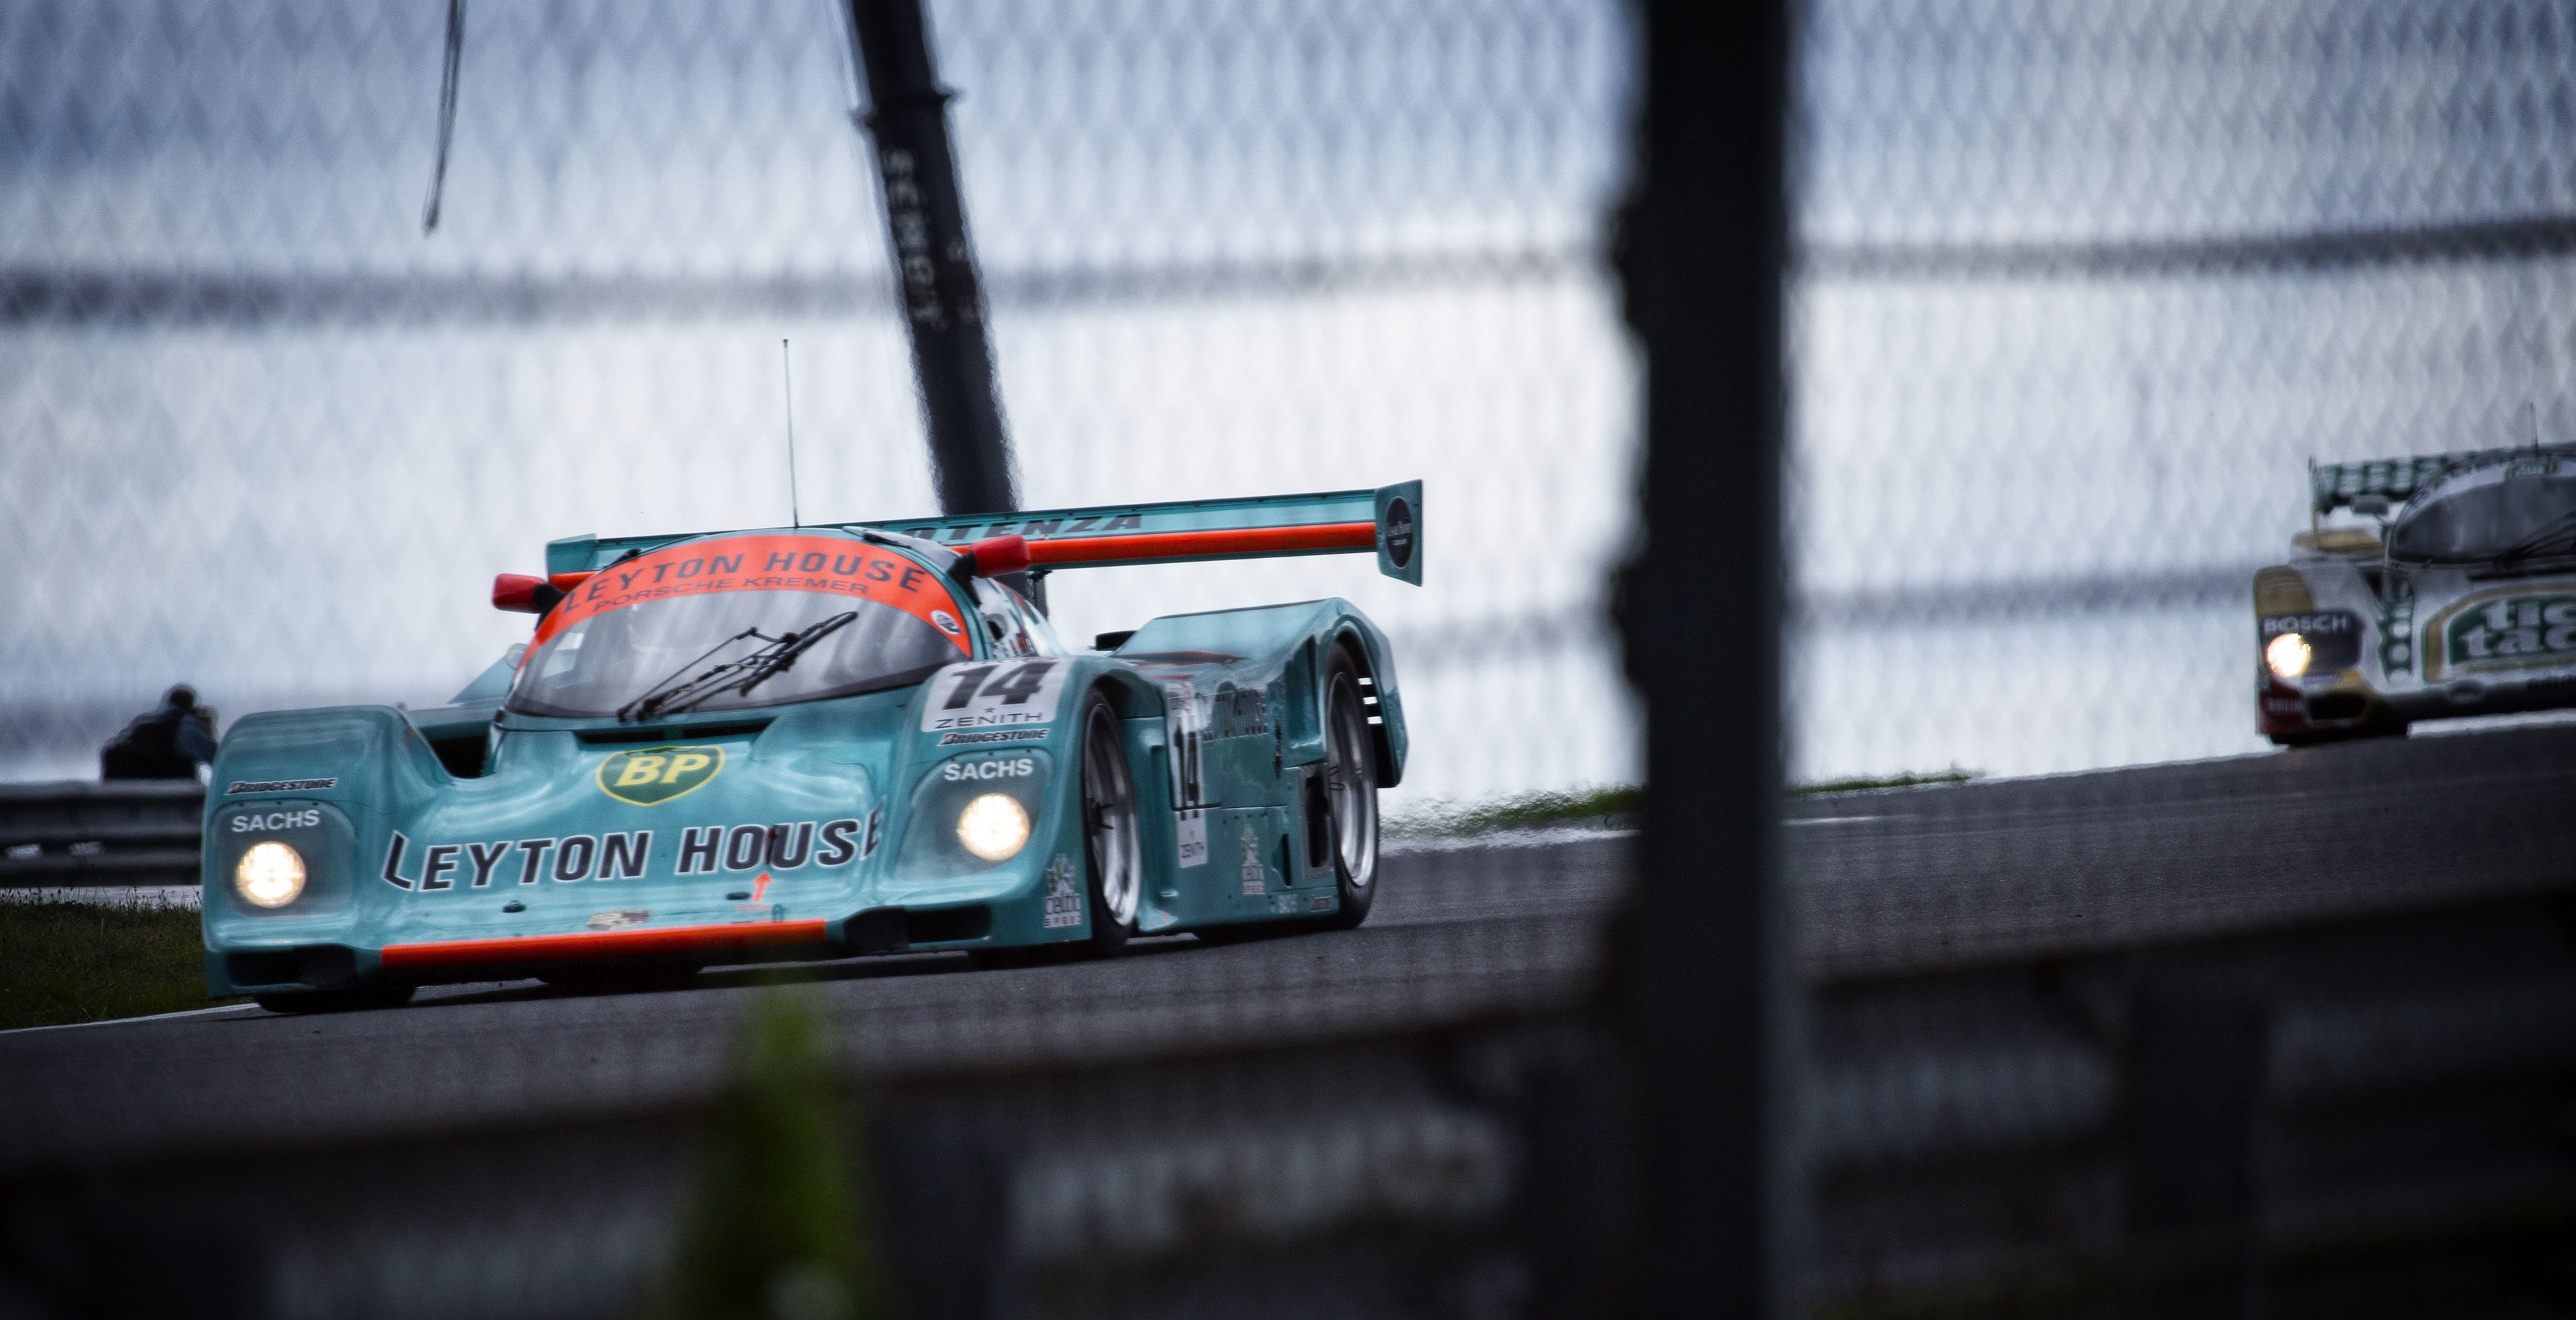 Wallpapers auto racing, Formula 1, sports, motorsport, racing